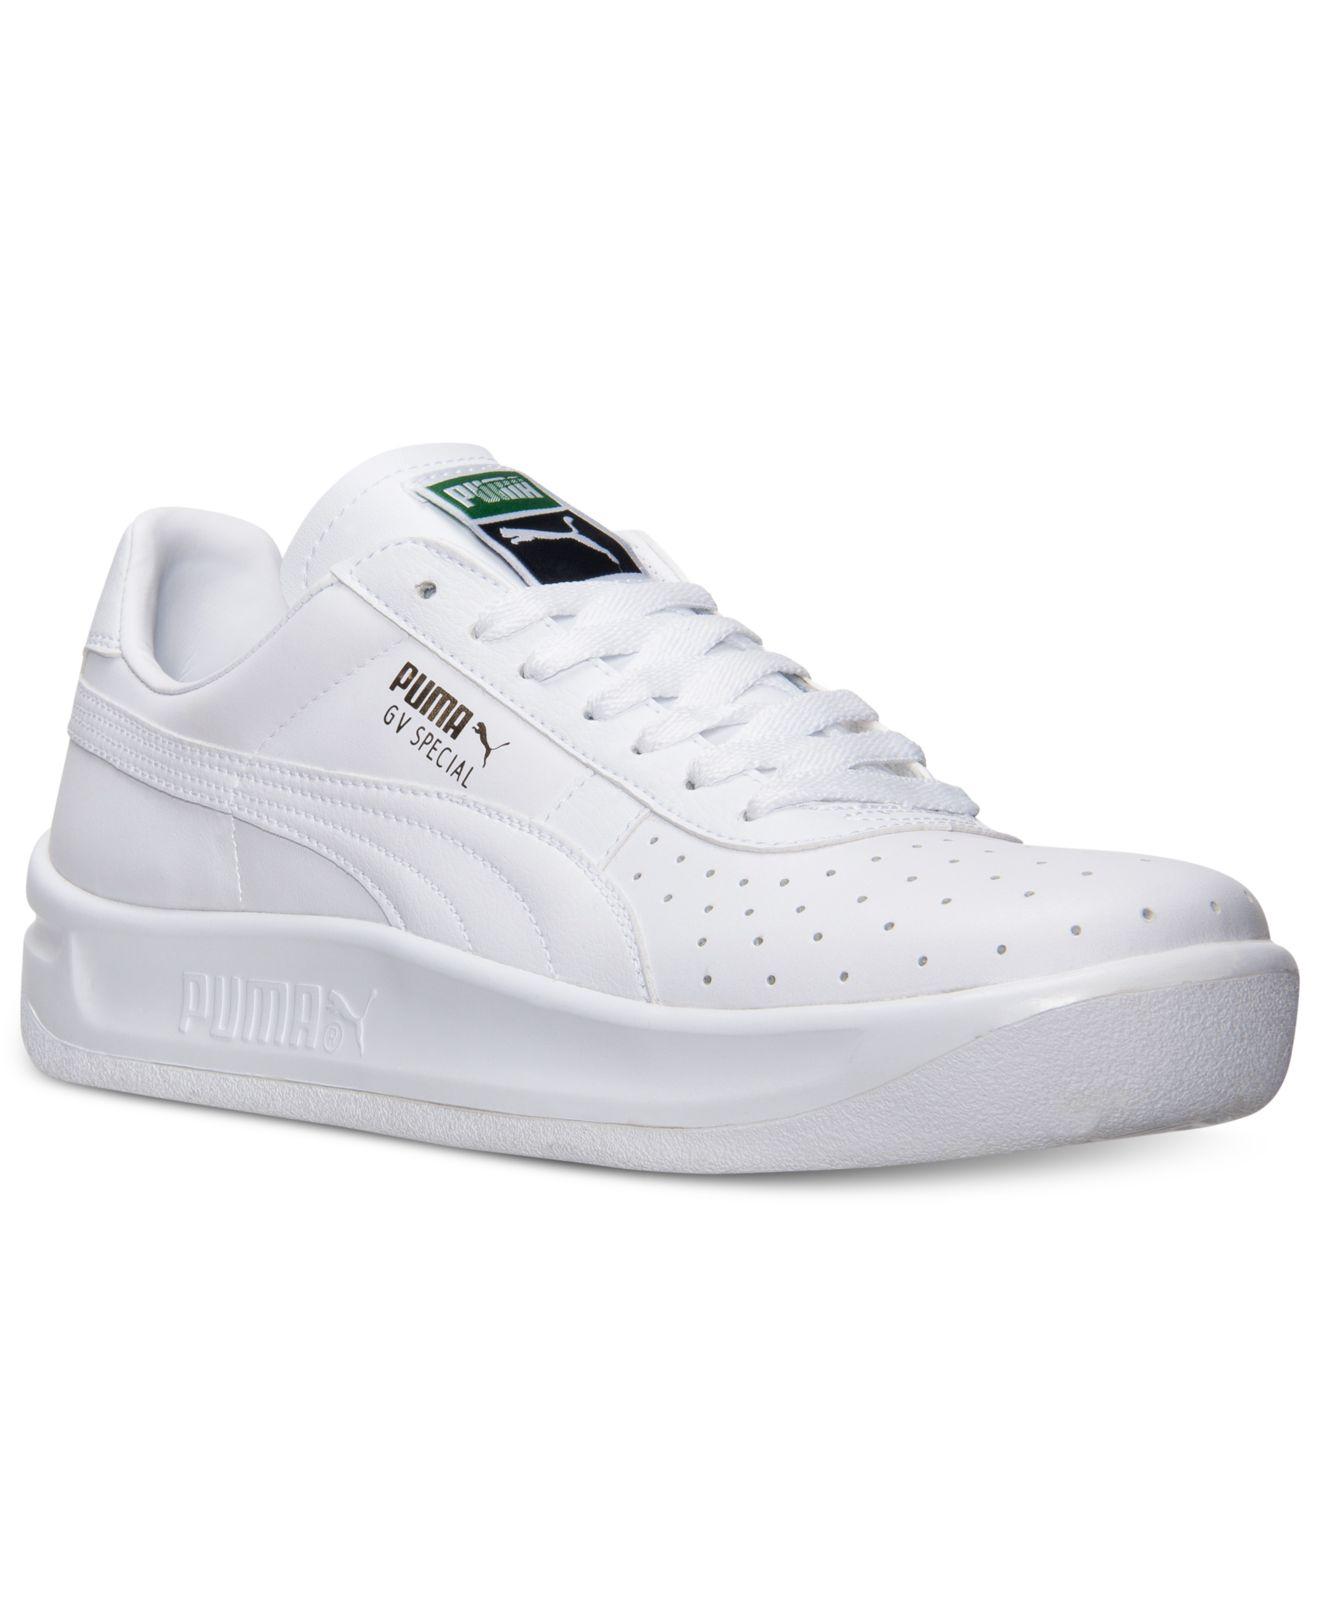 shoes for men puma